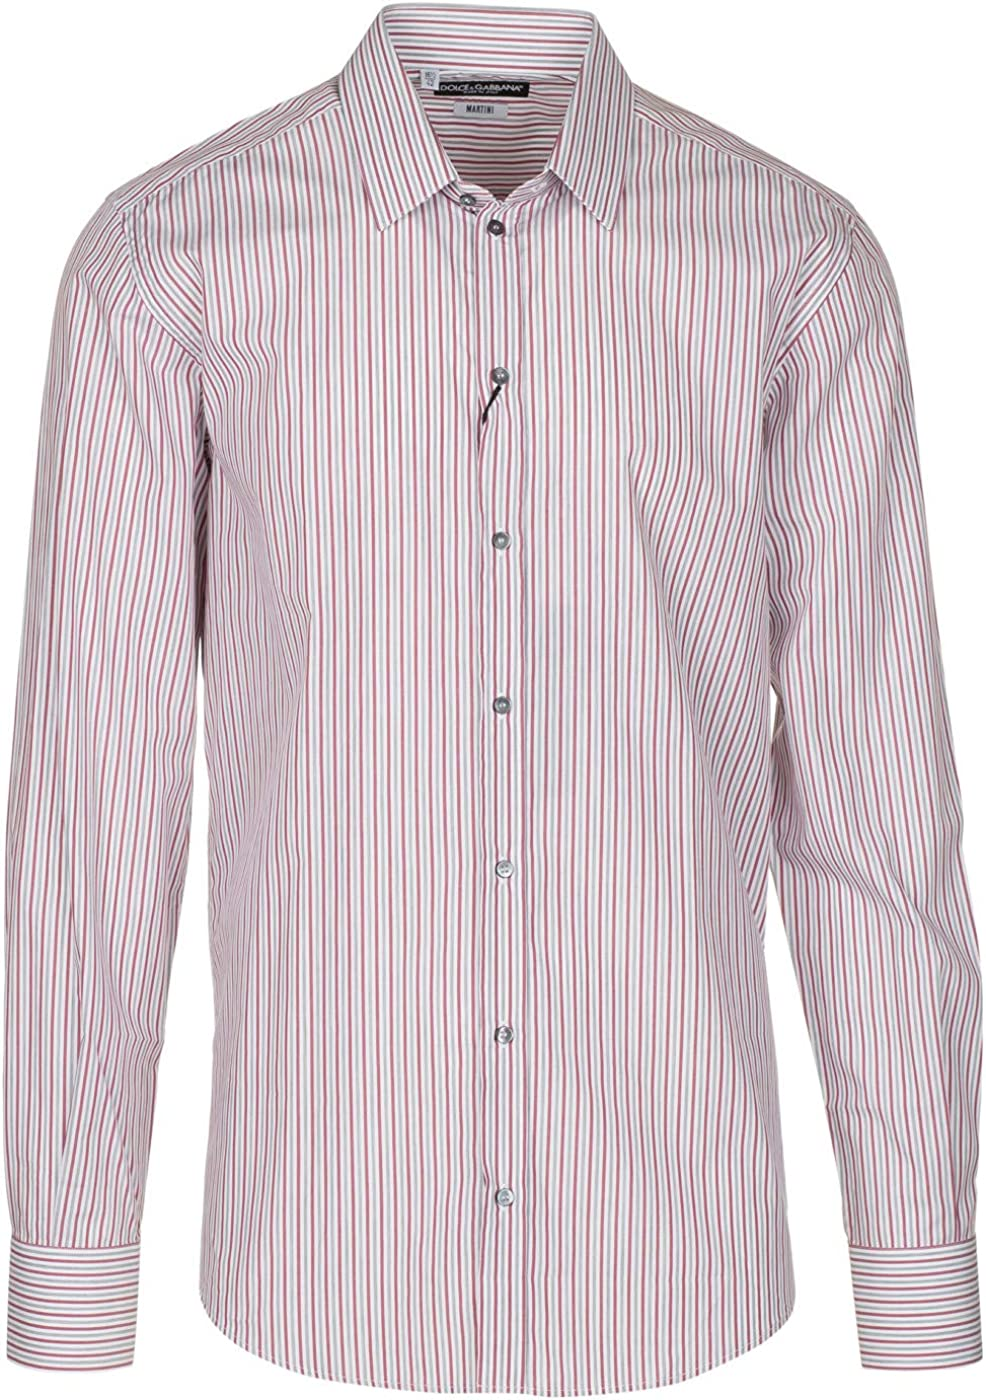 Dolce & Gabbana Men's 'Martini' Pinstripe Button Down Dress Shirt